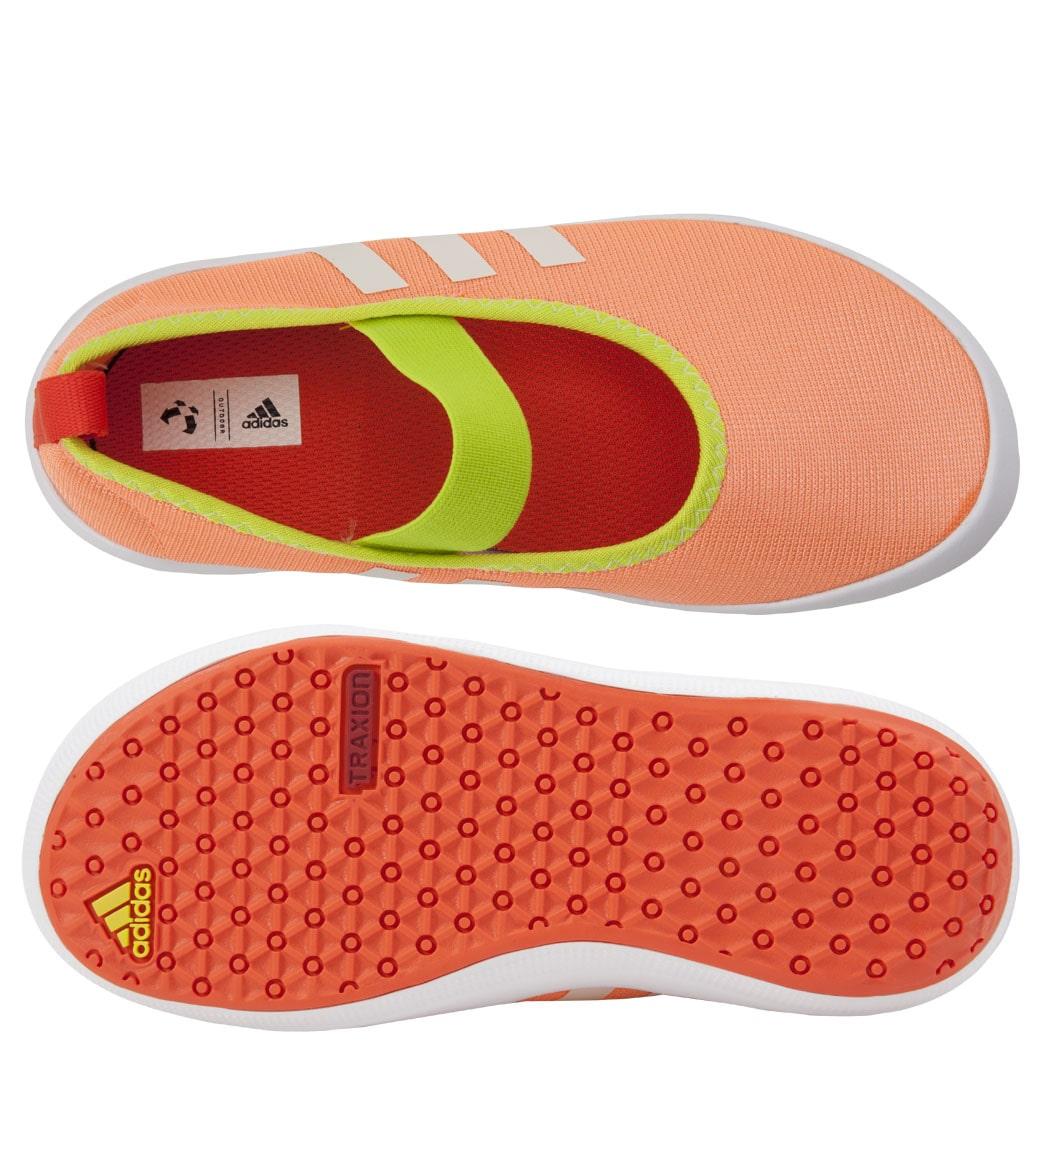 big sale 54ef8 29bea Adidas Girls Boat Slip-On Water Shoes